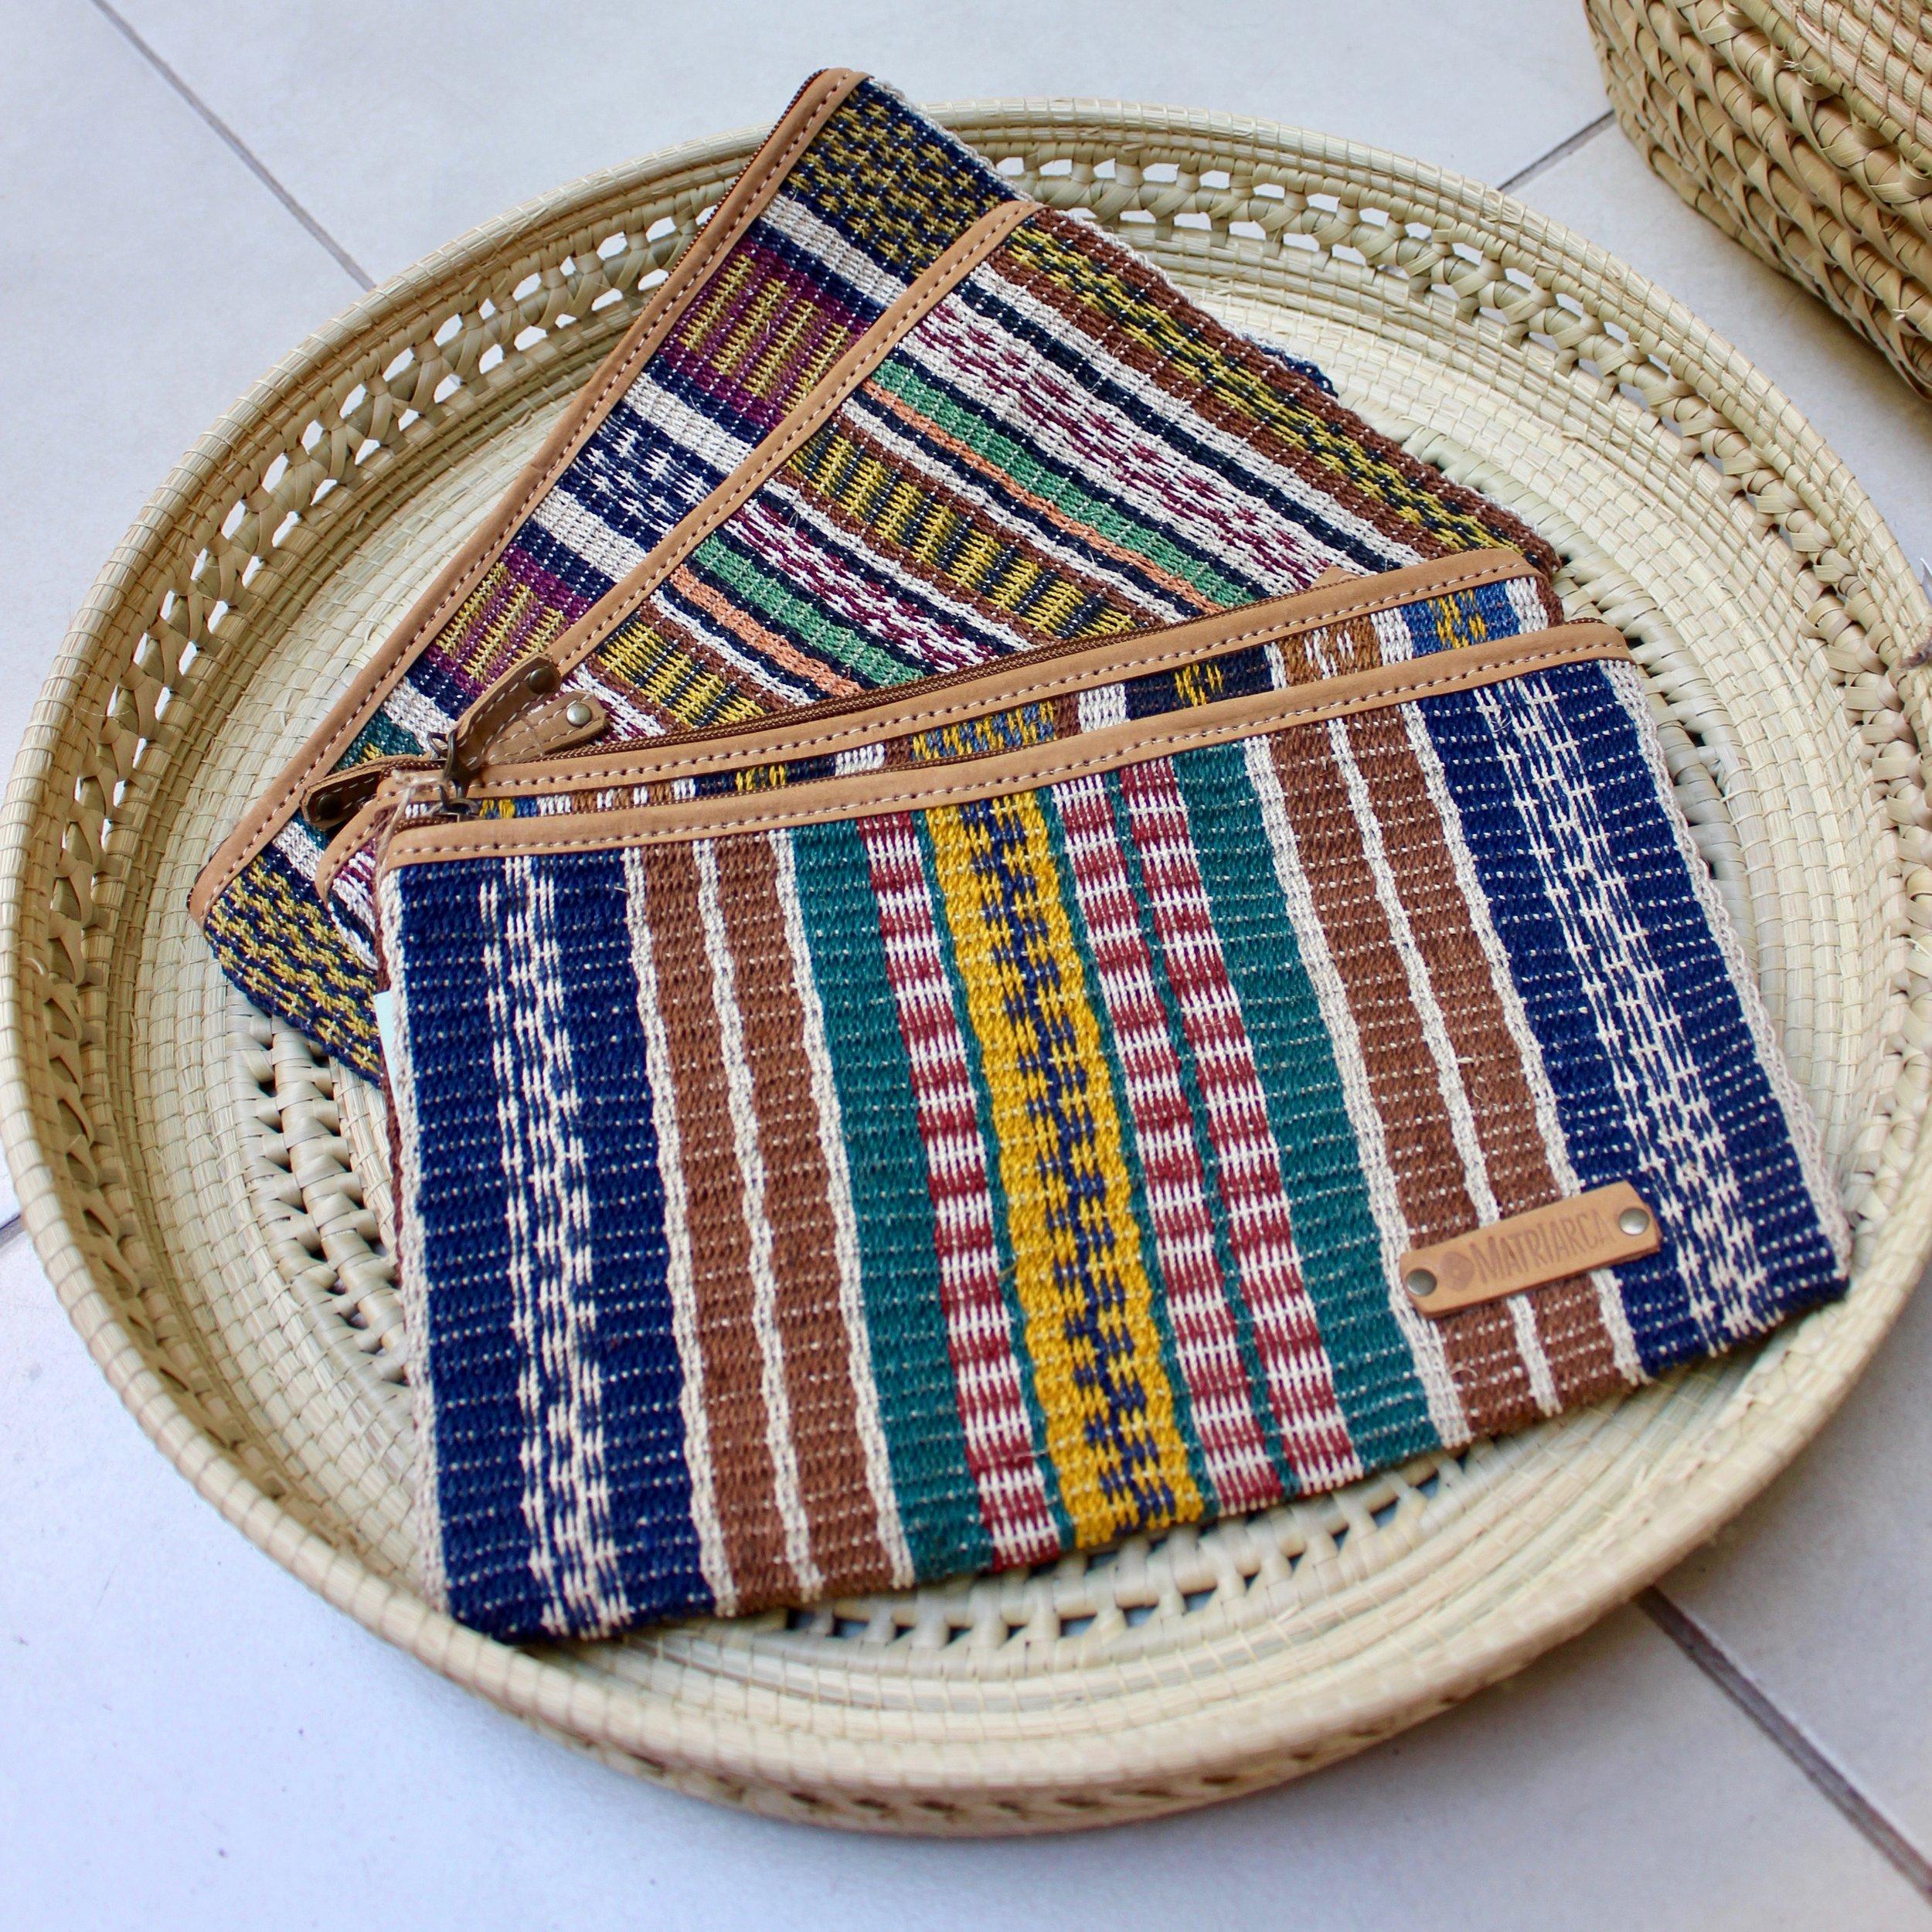 Artisanal handwoven bag by Indigenous Argentinian women